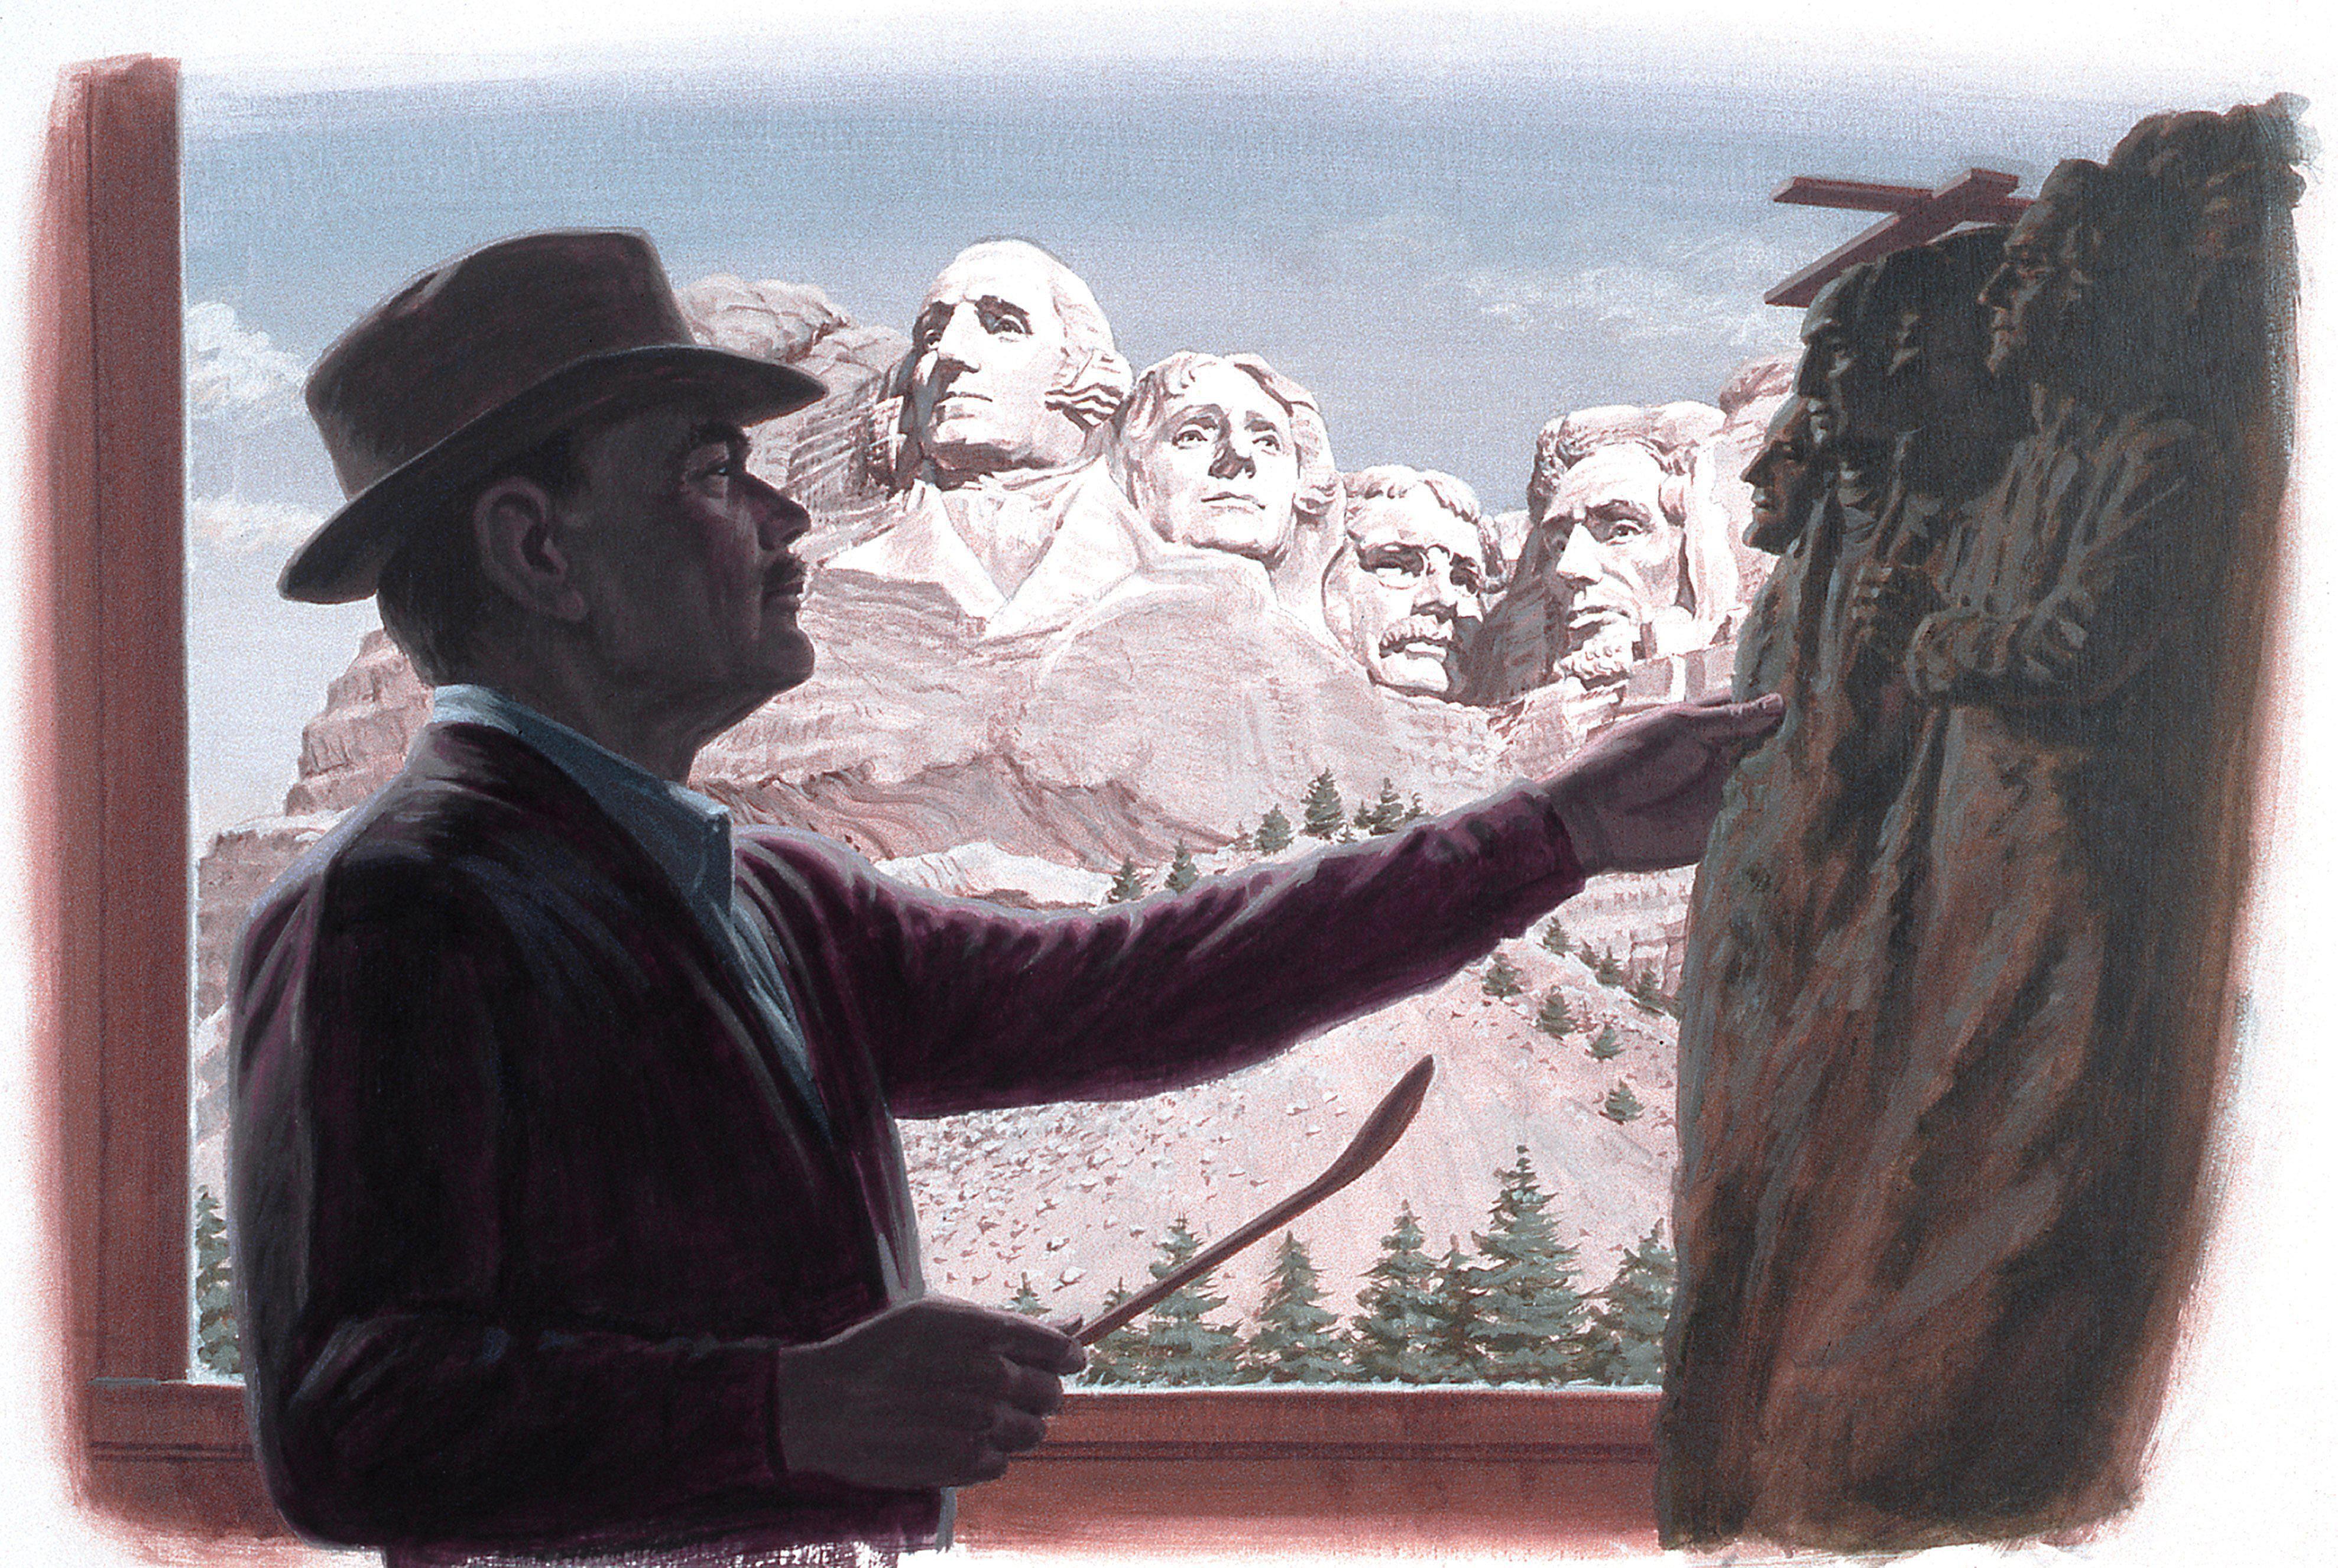 A painting of sculptor Gutzon Borglum